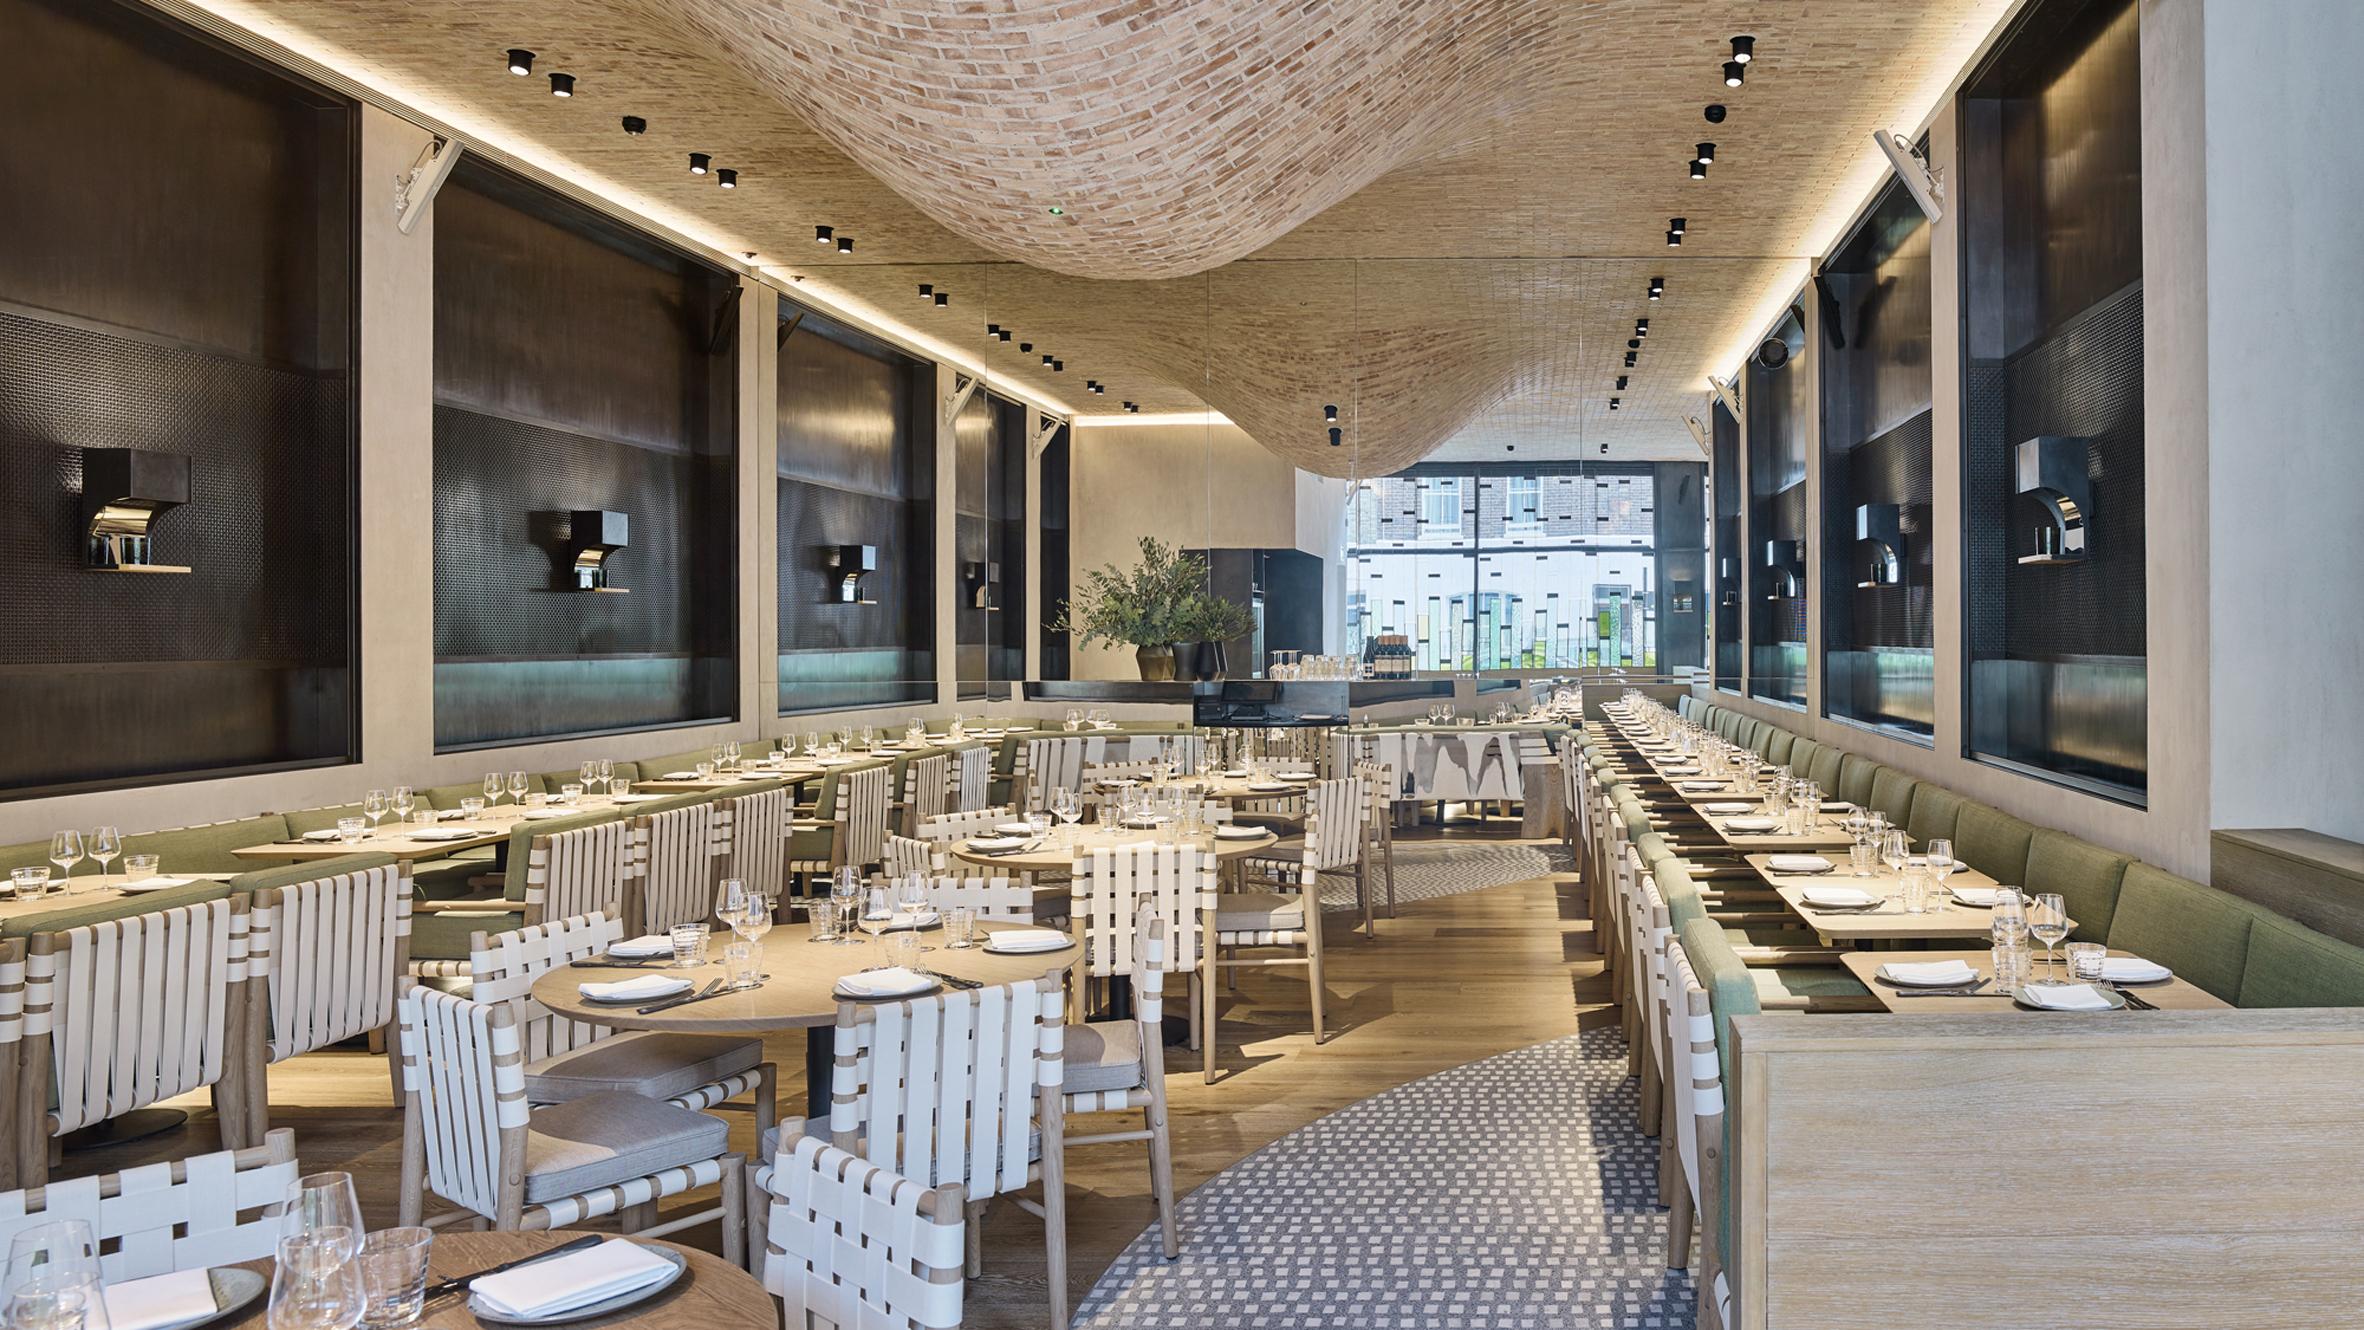 fucina-restaurant-andy-martin-architecture-interiors-london_dezeen_hero